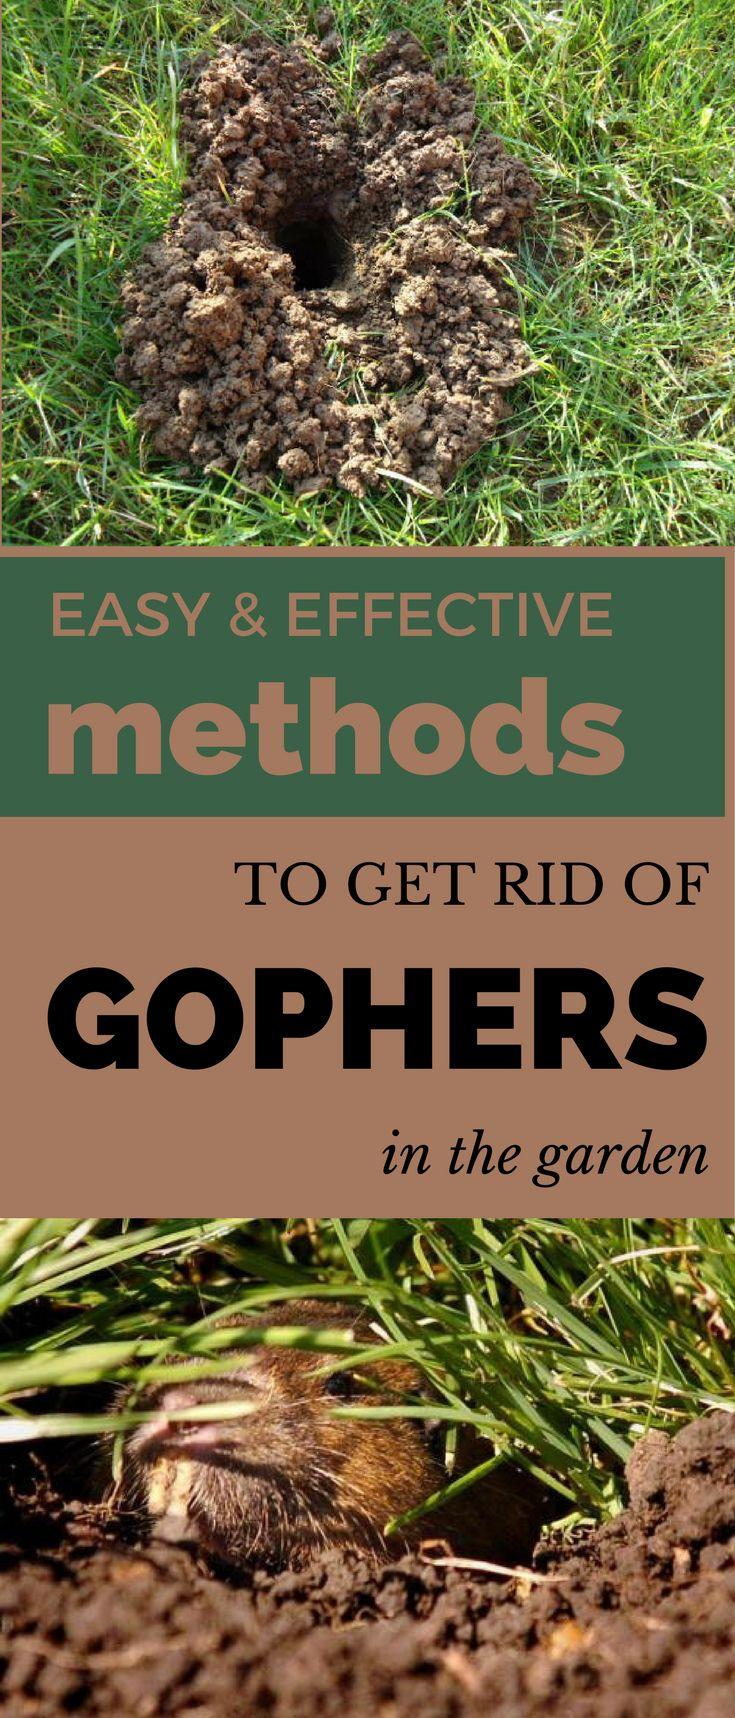 430 best Gardening images on Pinterest   Backyard ideas, Garden ...